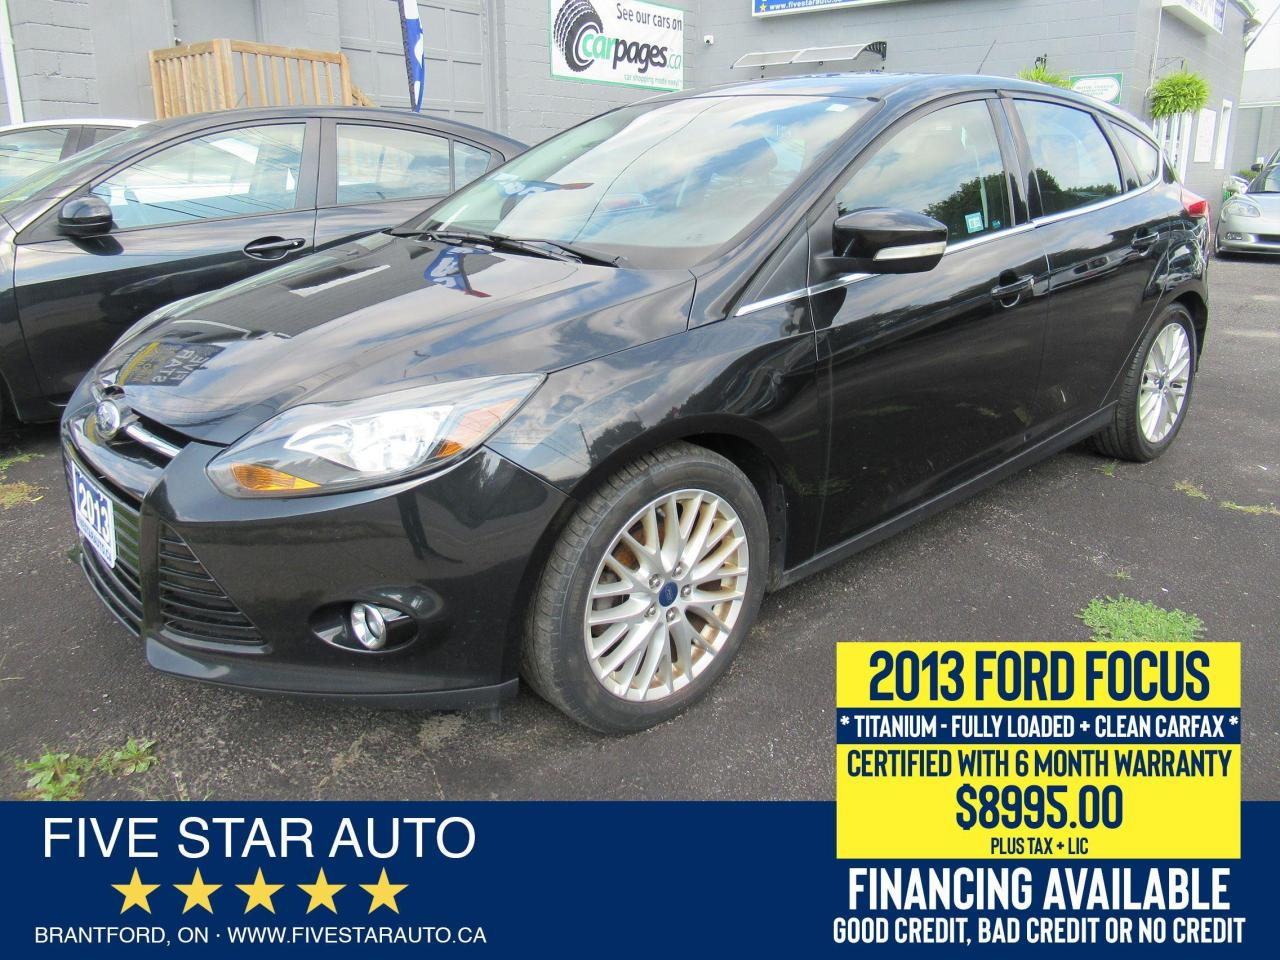 2013 Ford Focus Titanium *Clean Carfax* Certified + 6 Mth Warranty